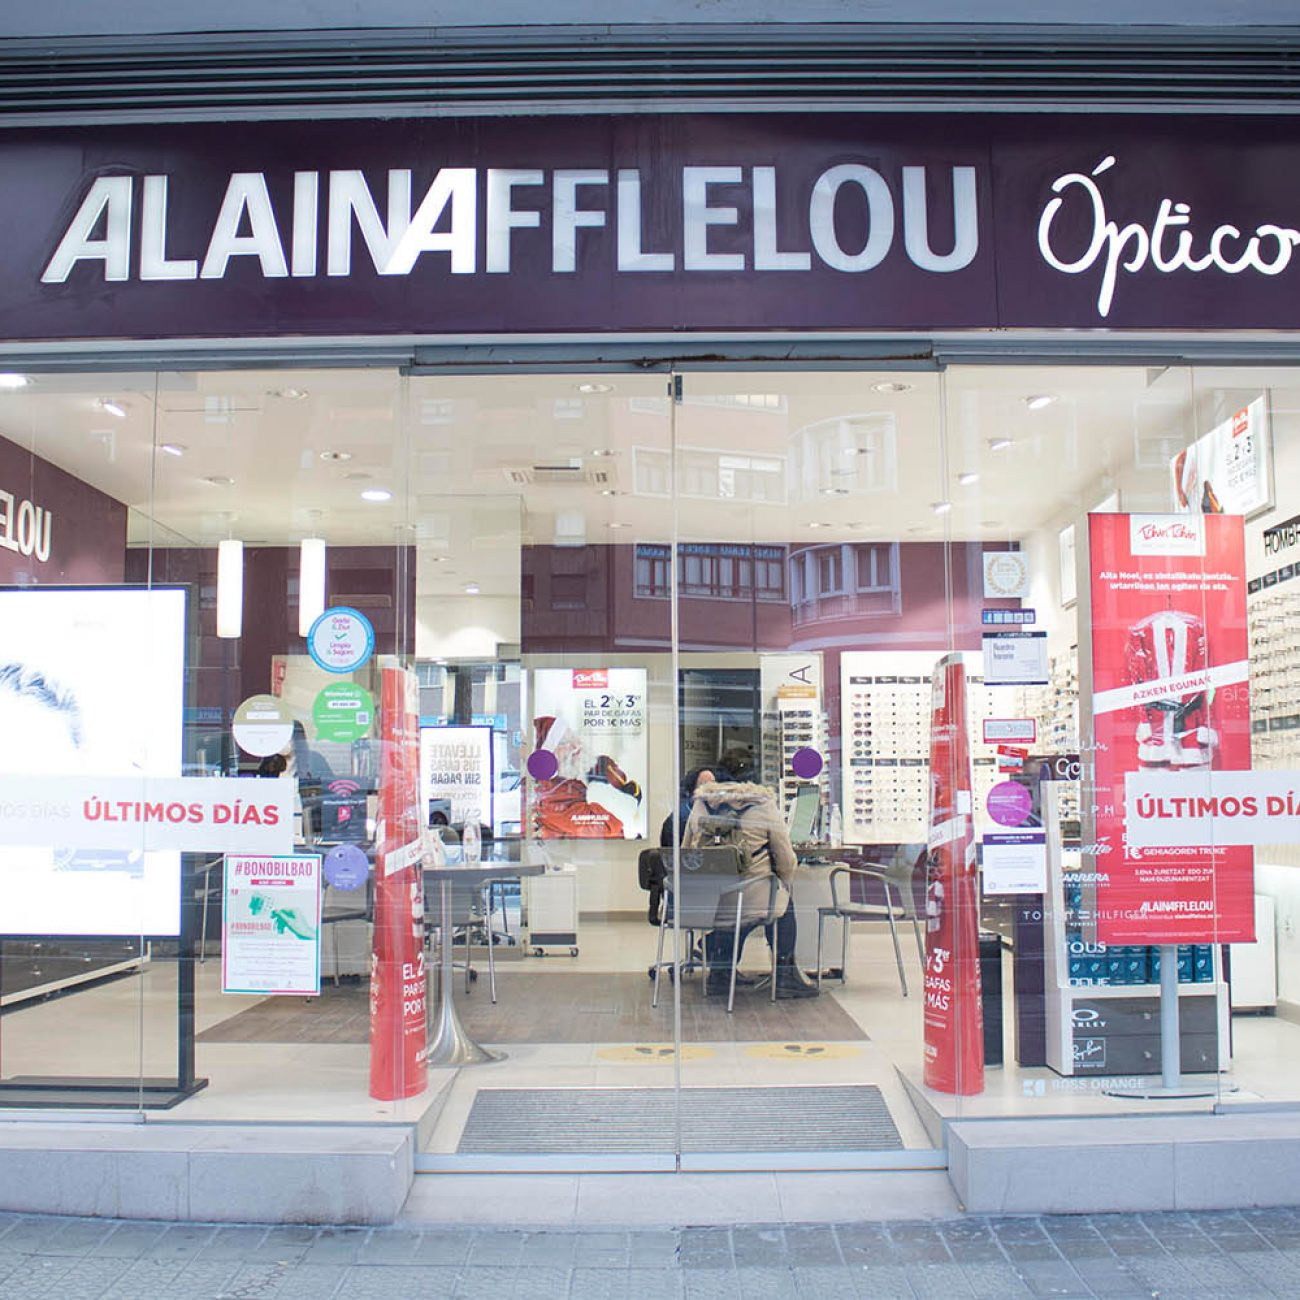 Alain Afflelou, óptica en Deusto